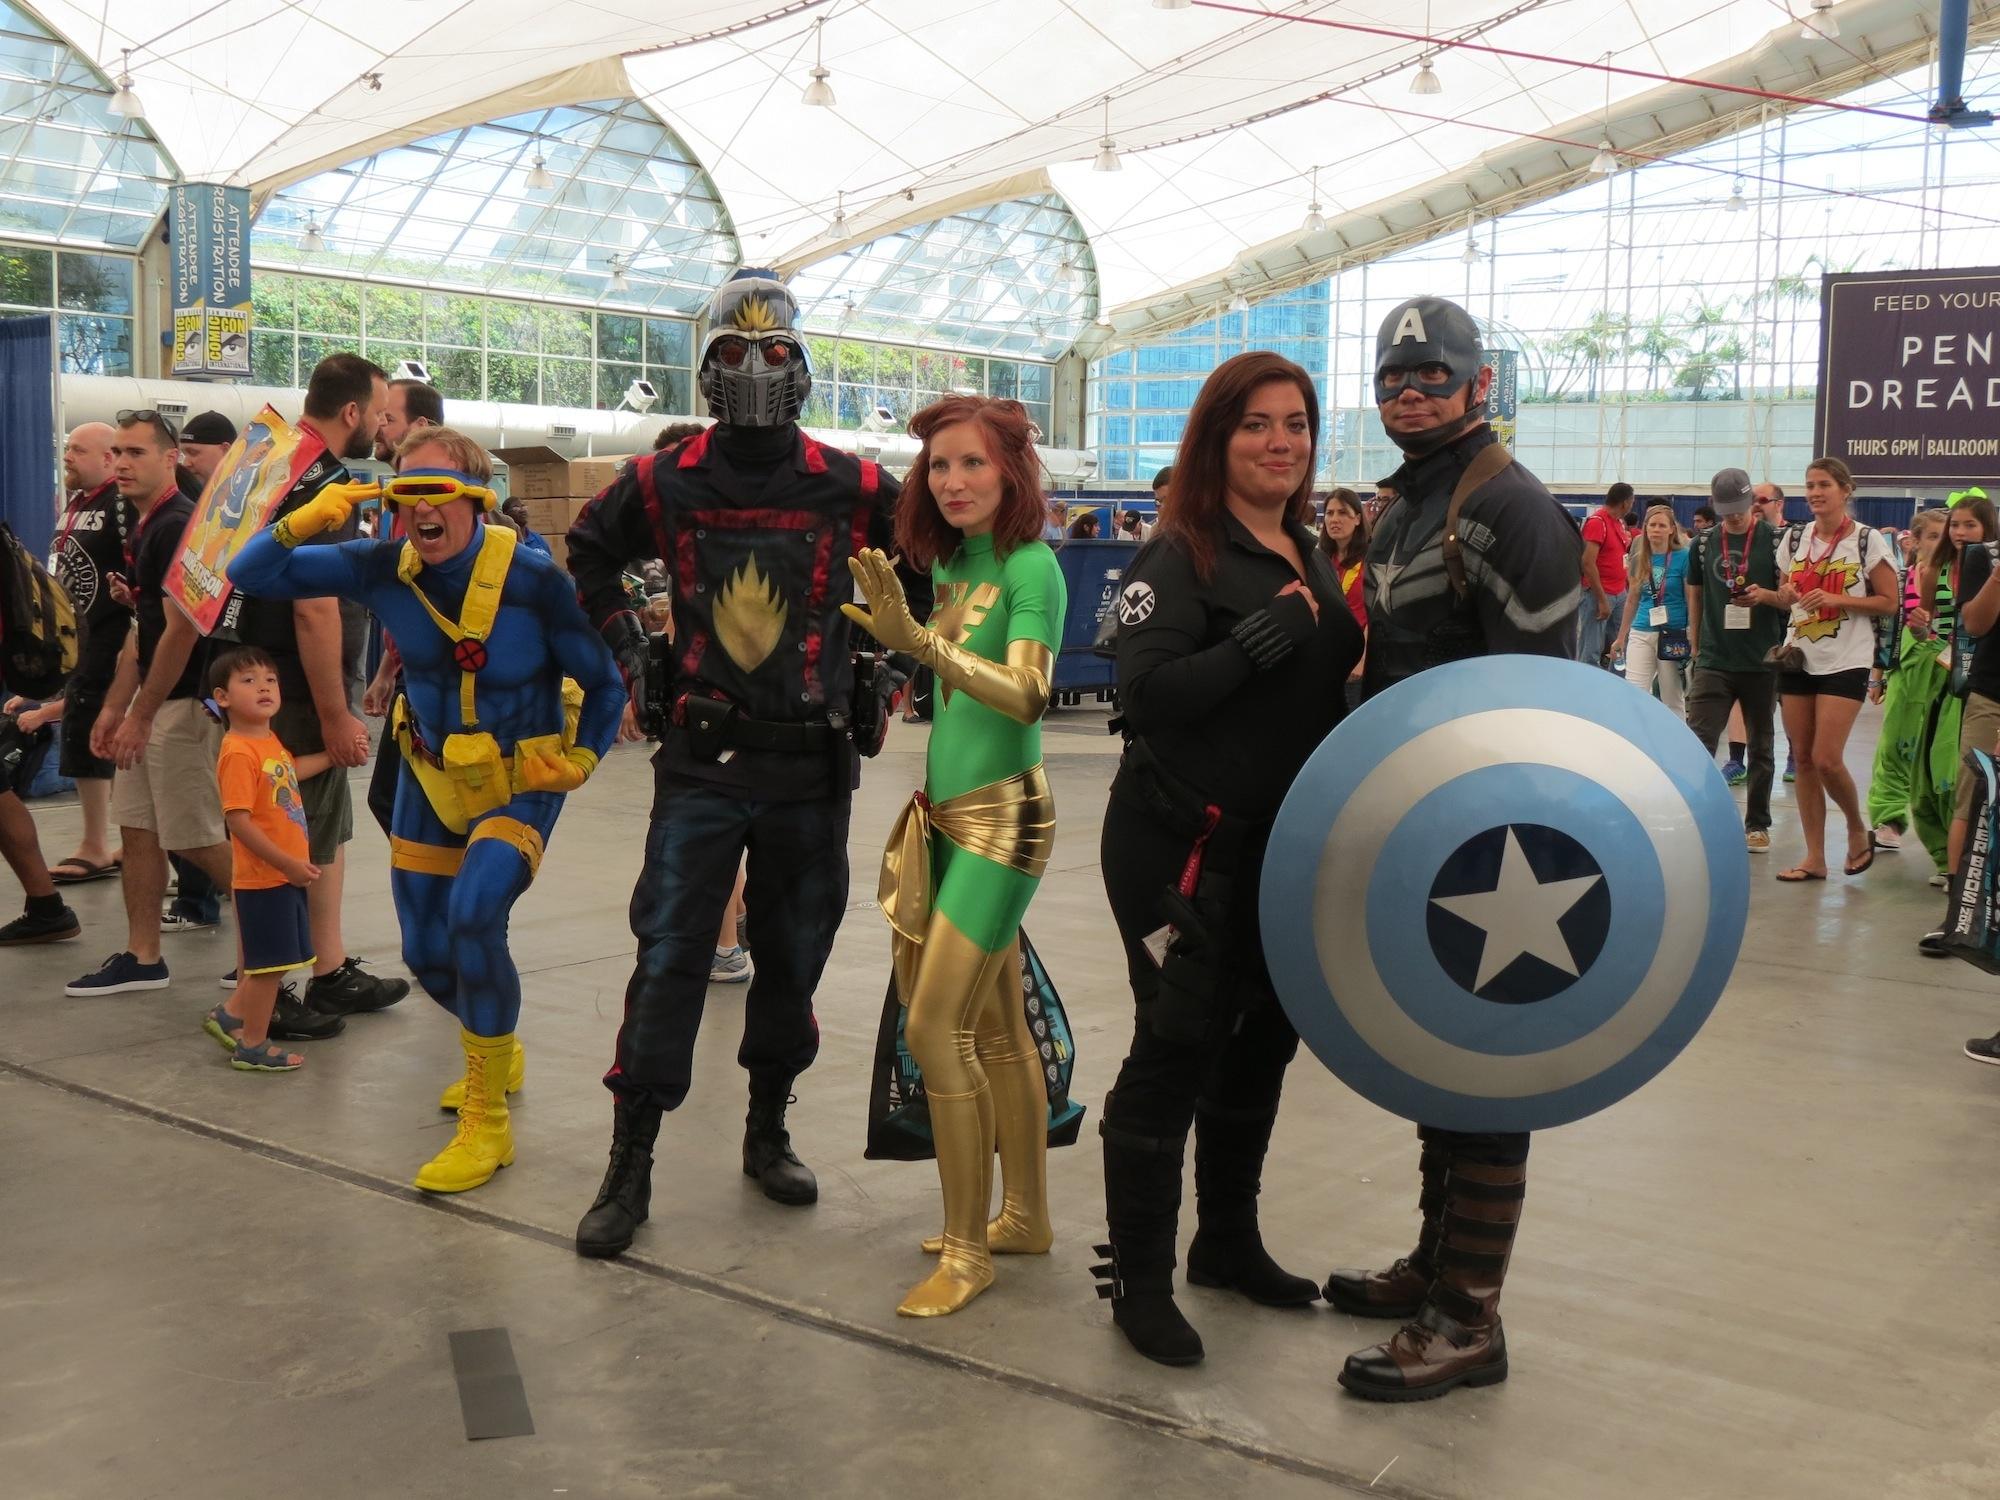 Marvel folks!